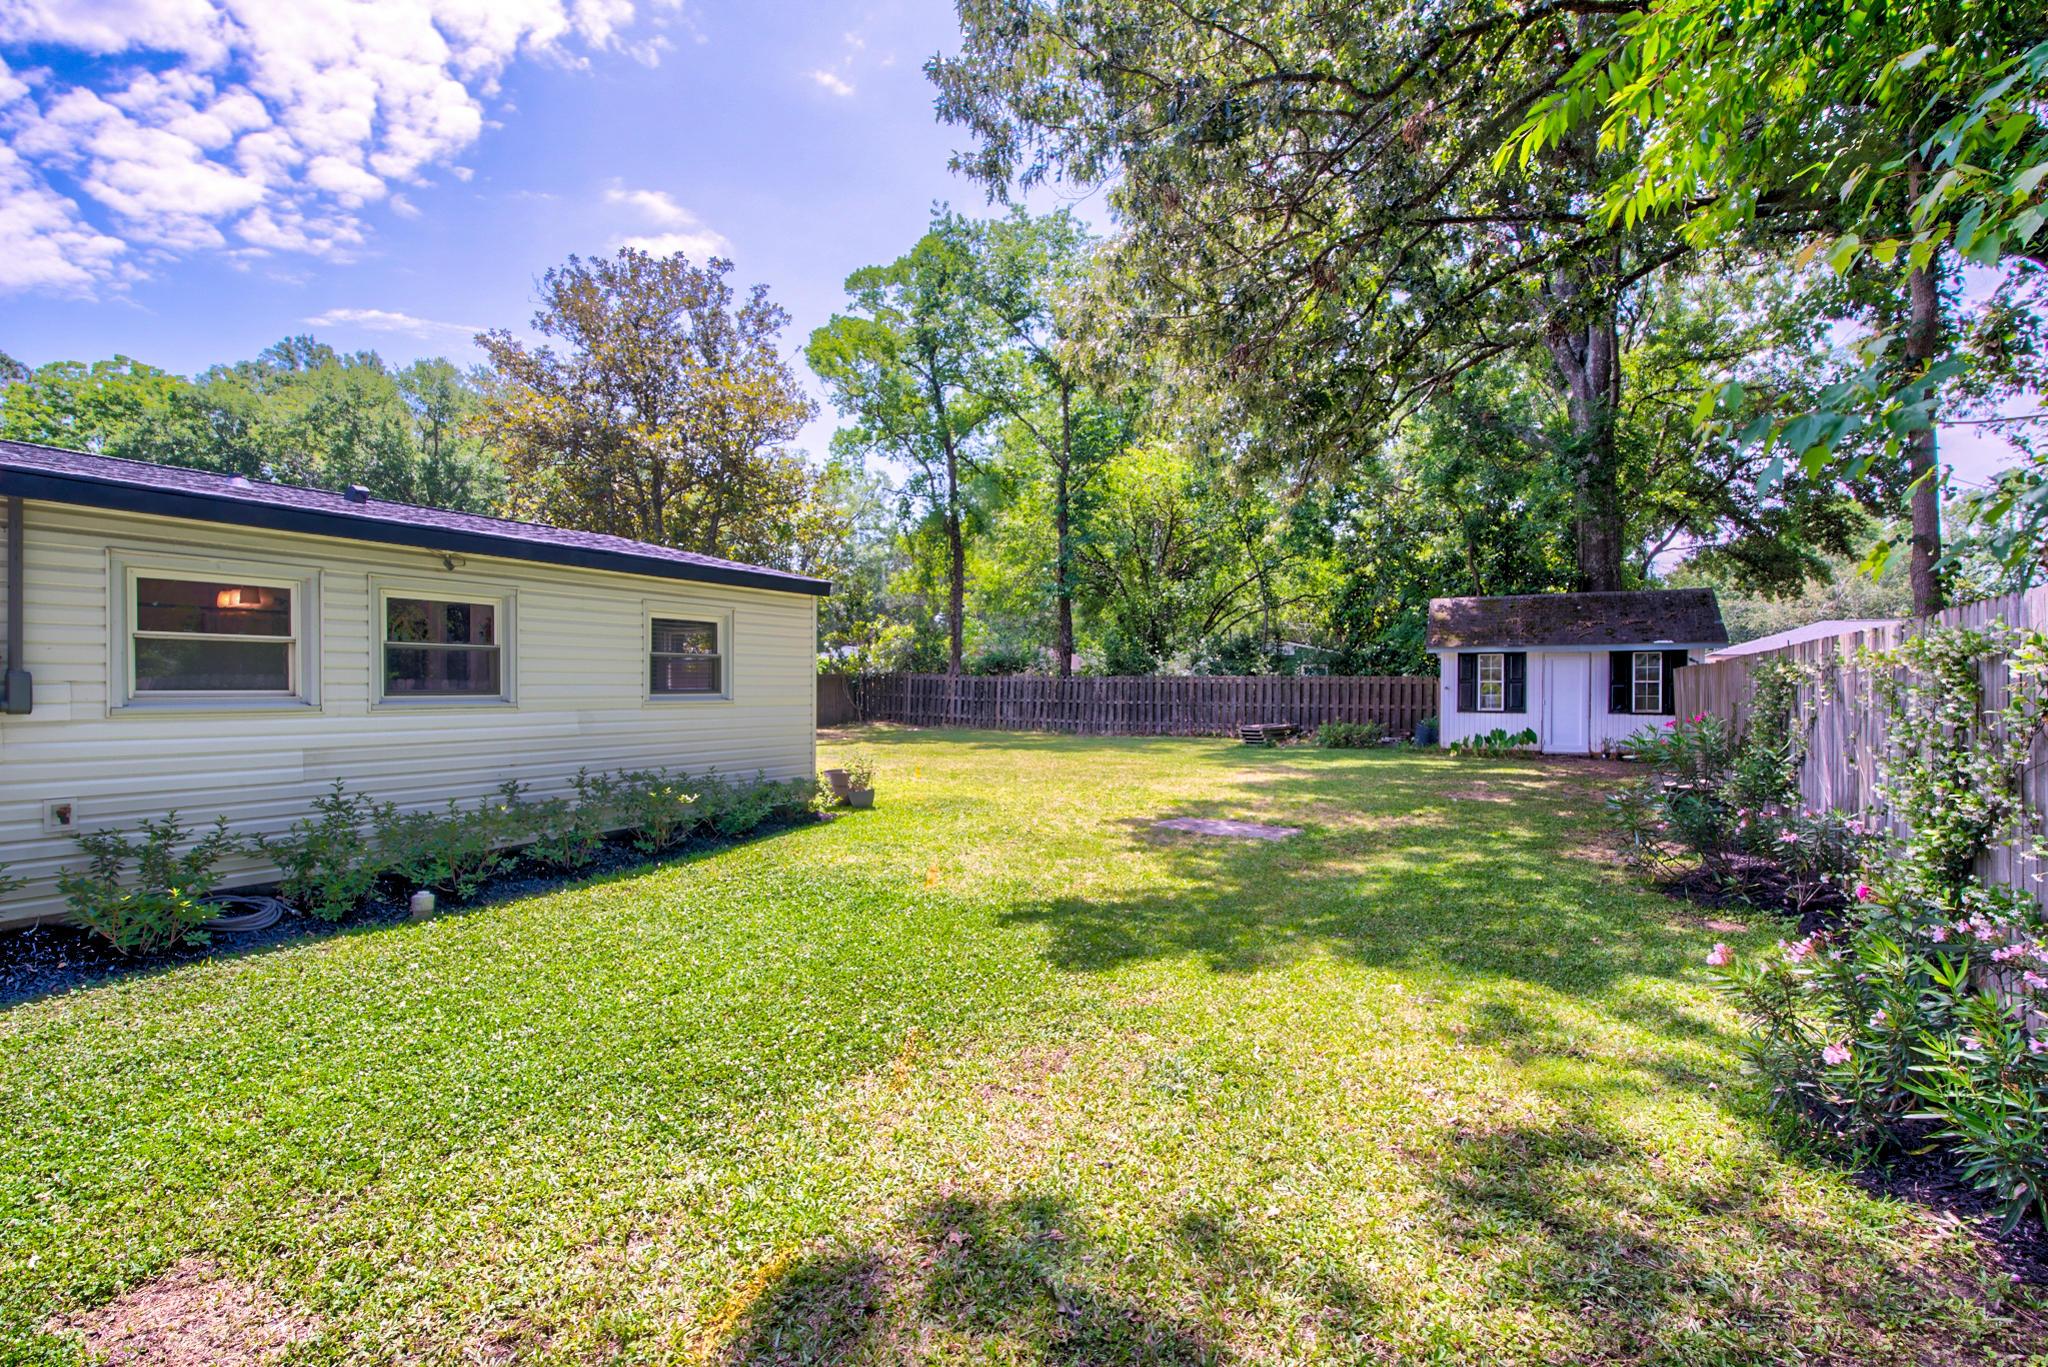 Oakland Homes For Sale - 2131 Clayton, Charleston, SC - 16